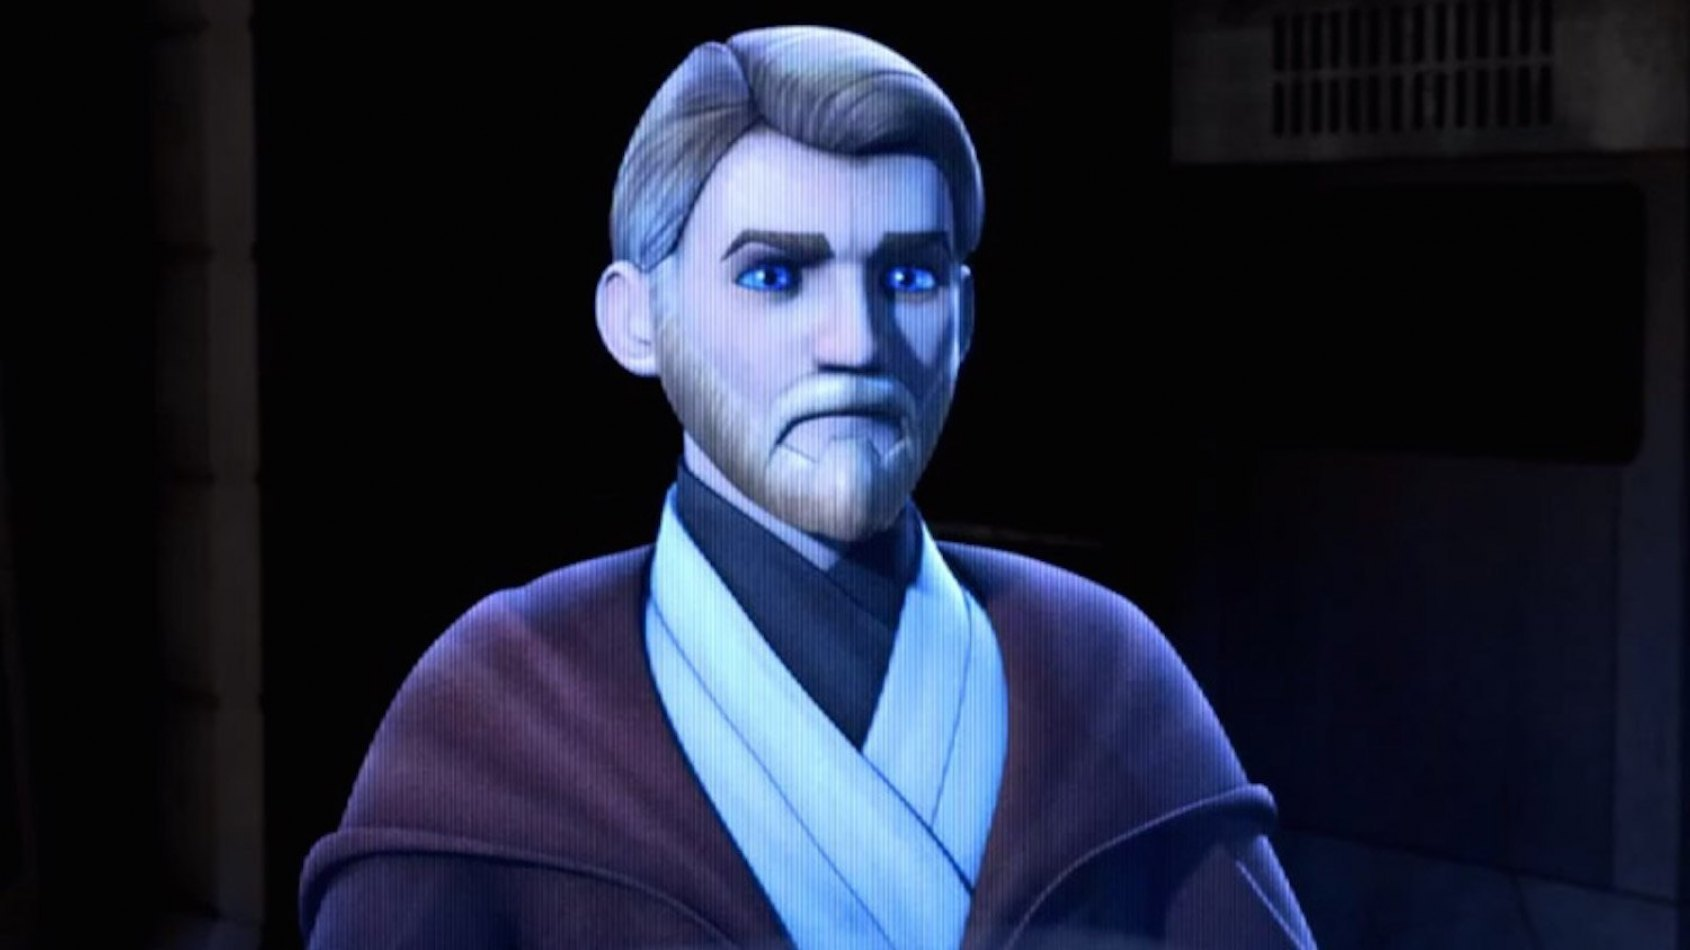 Obi-Wan Kenobi de retour dans la saison 3 de Rebels?